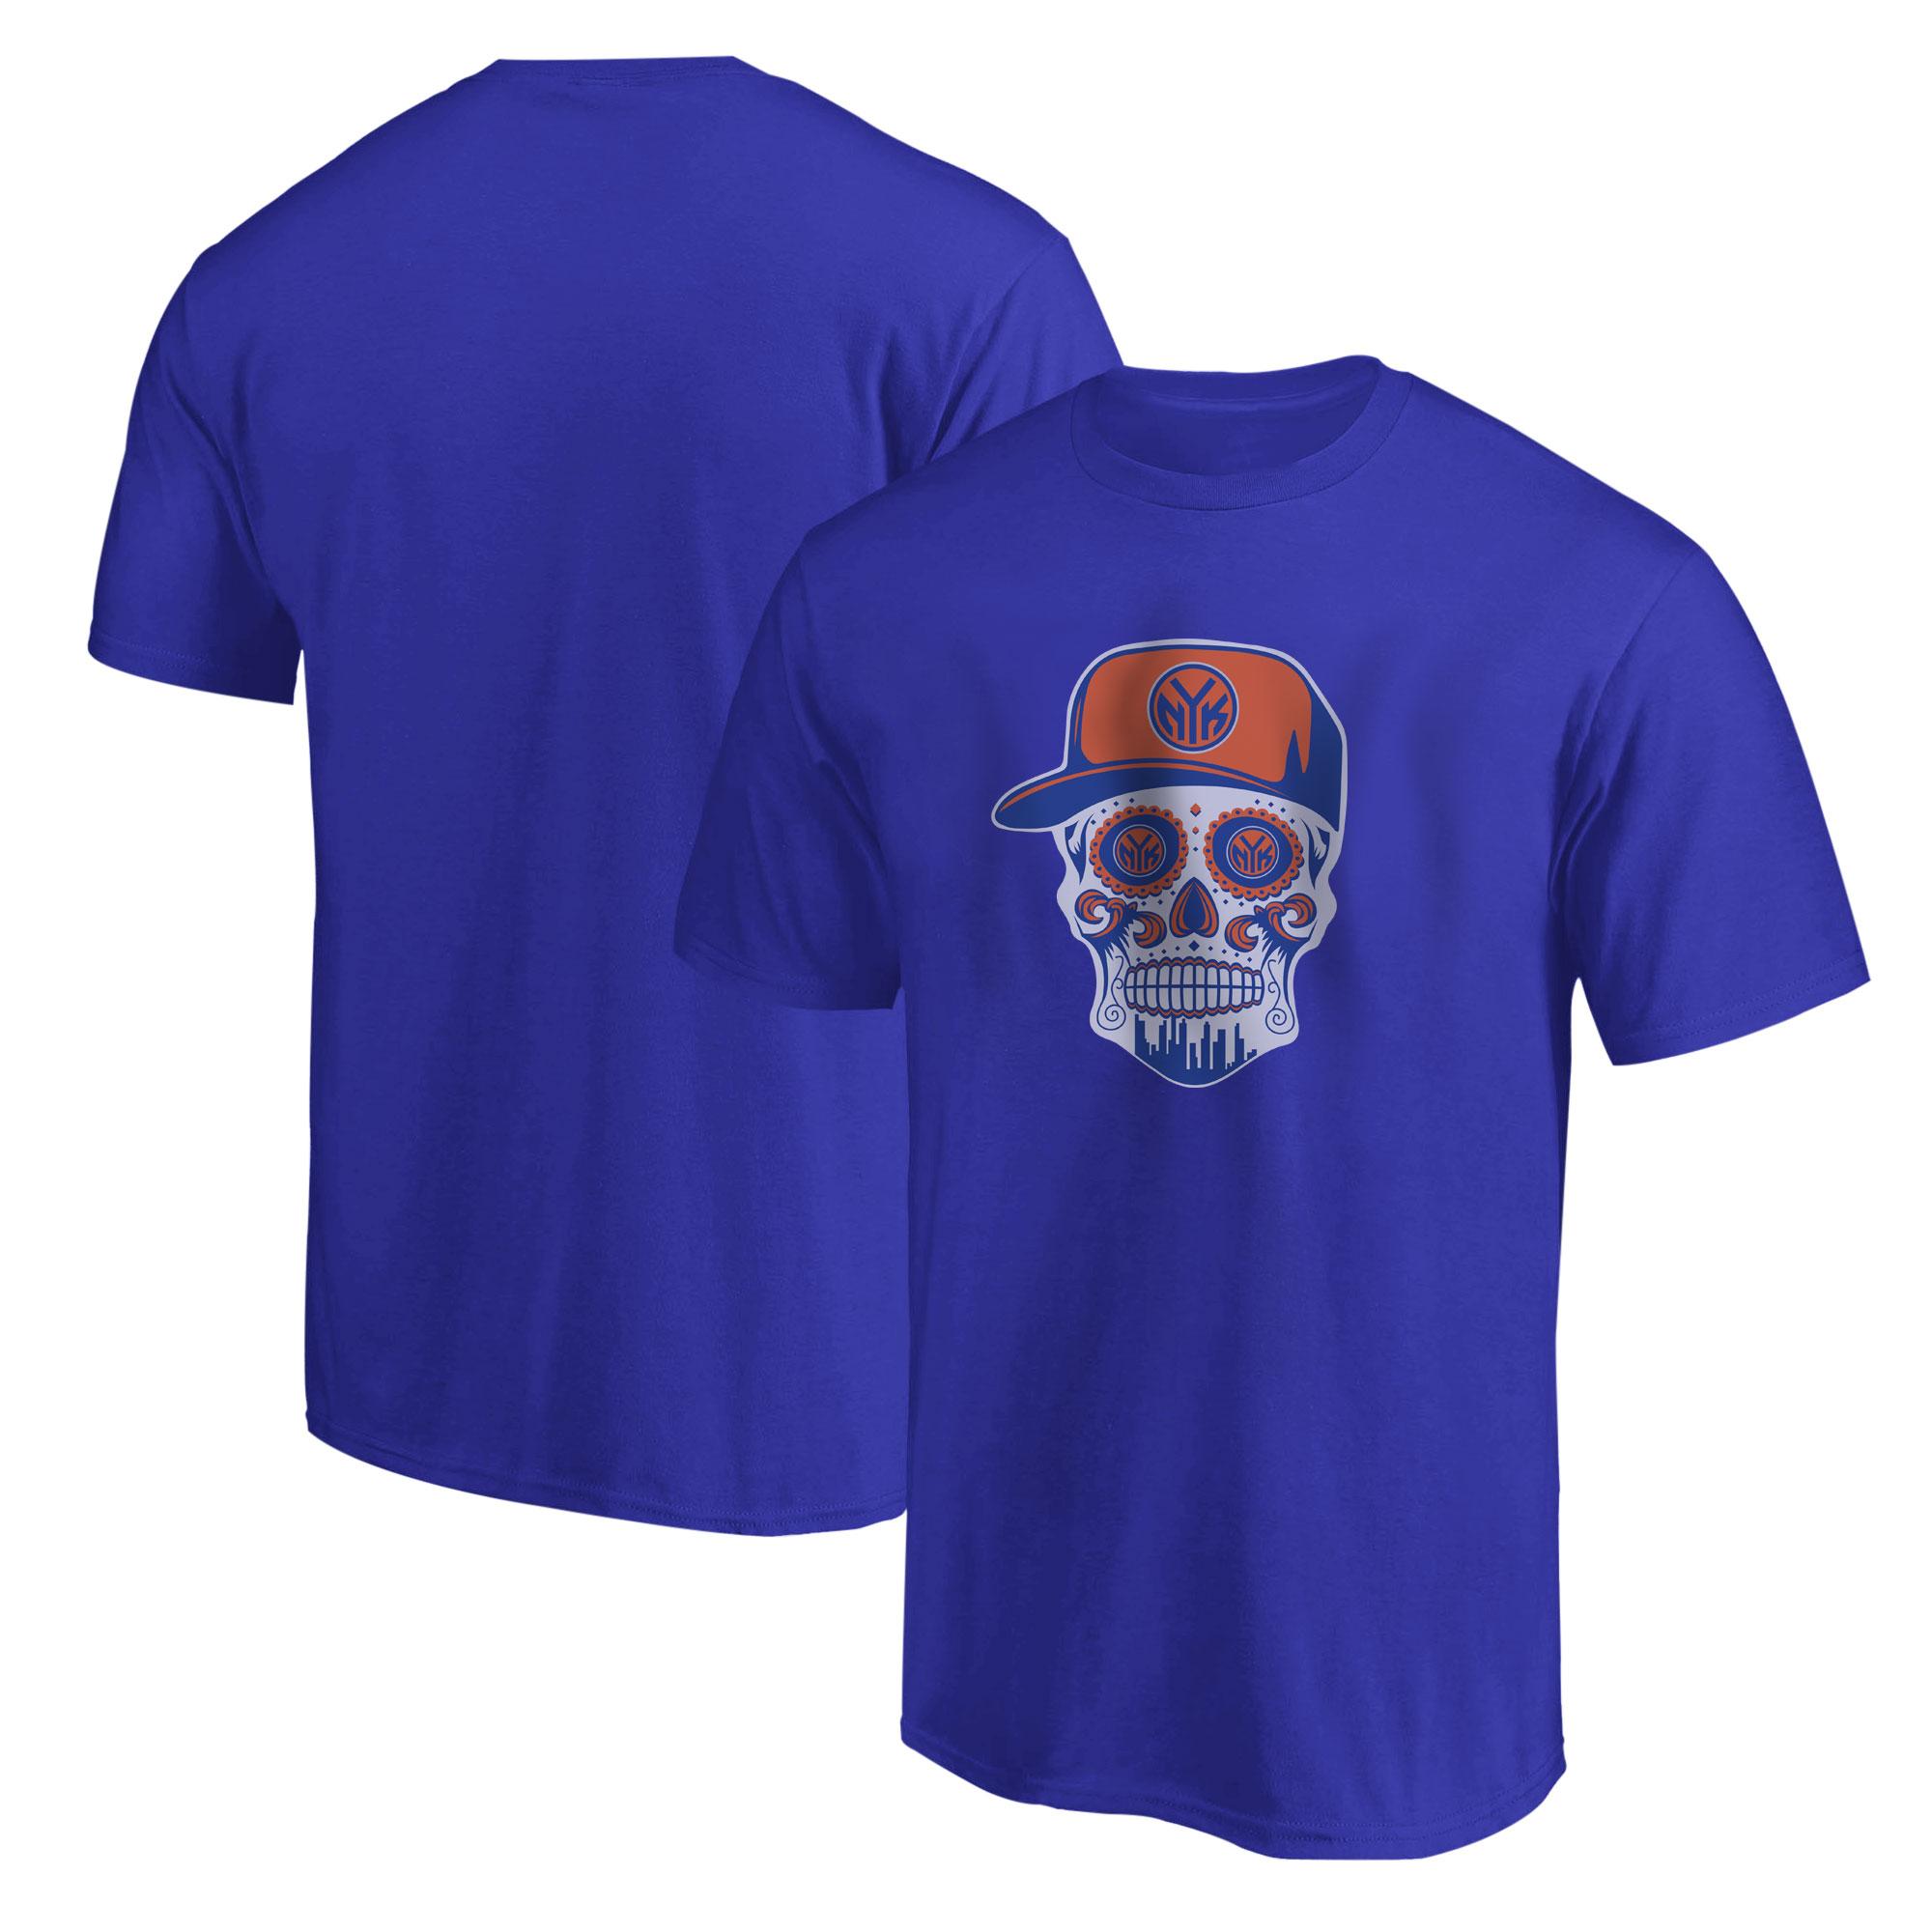 Knicks Skull Tshirt (TSH-BLU-NP-458-NBA-NYK-SKULL)